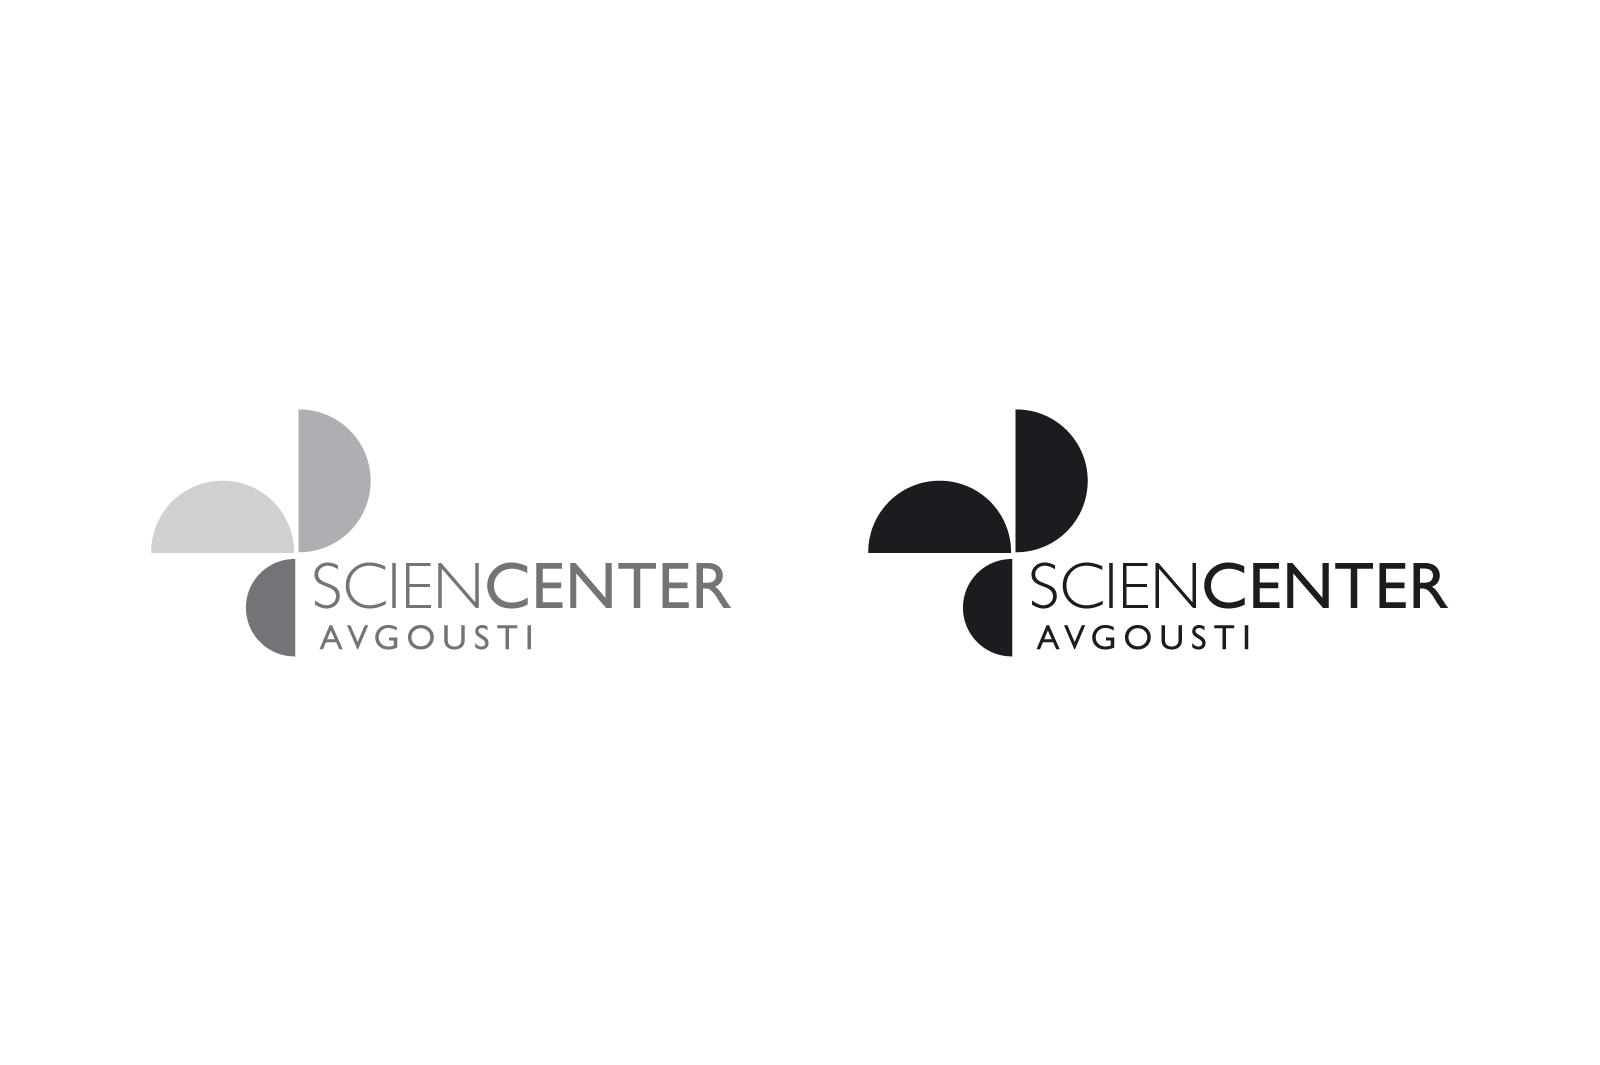 sciencenter_logo011.png